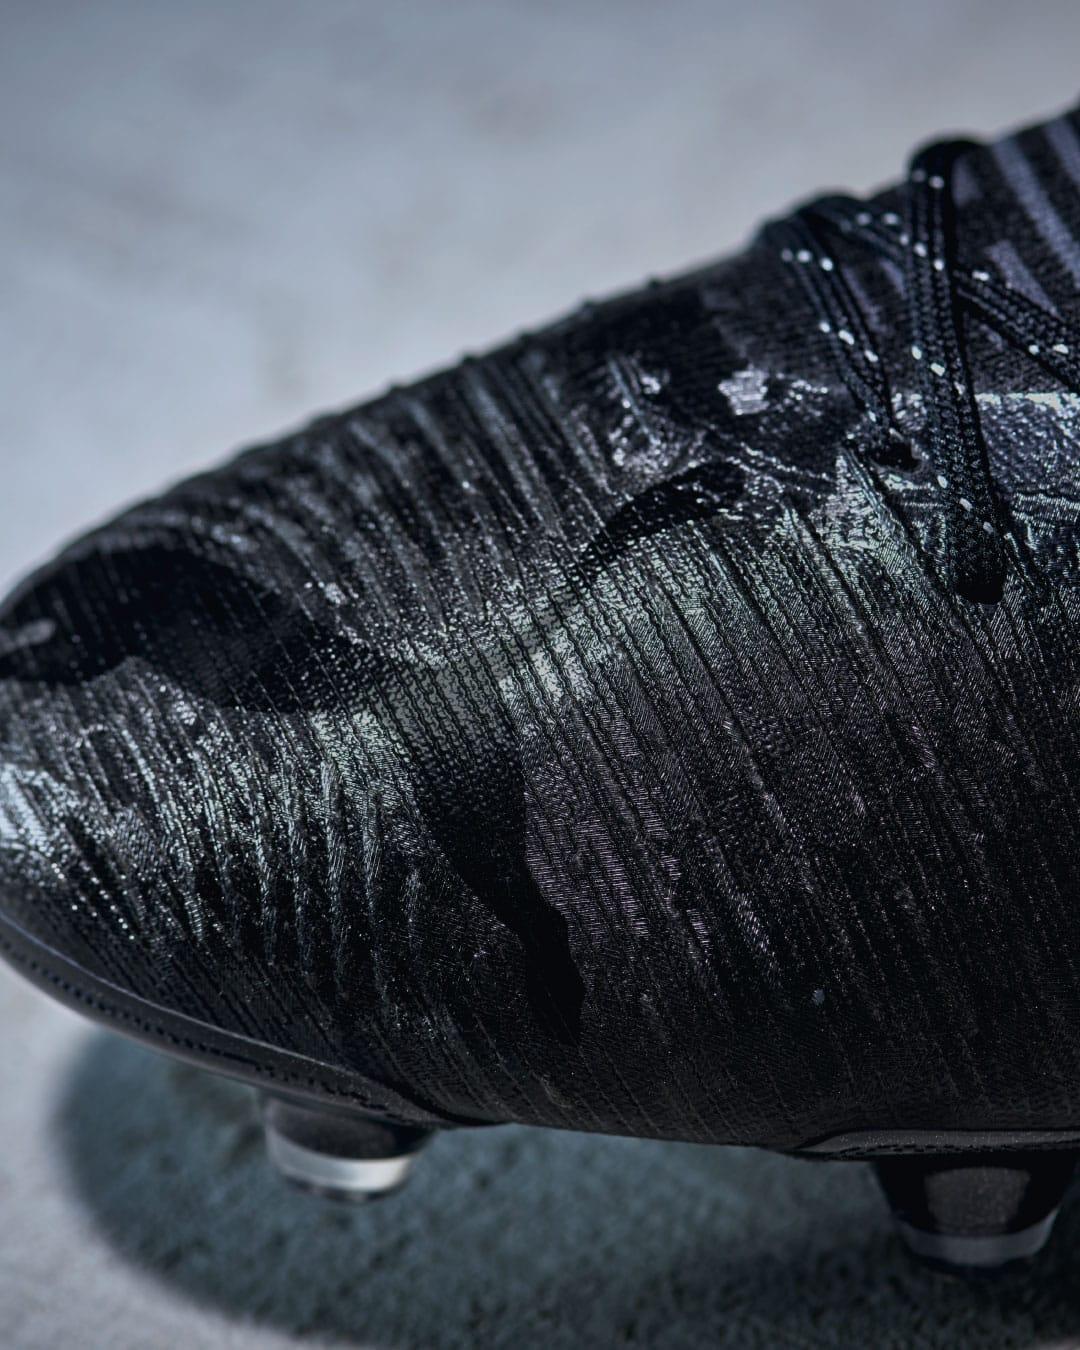 chaussures-football-puma-ultra-puma-future-z-eclipse-pack-2021-footpack-2